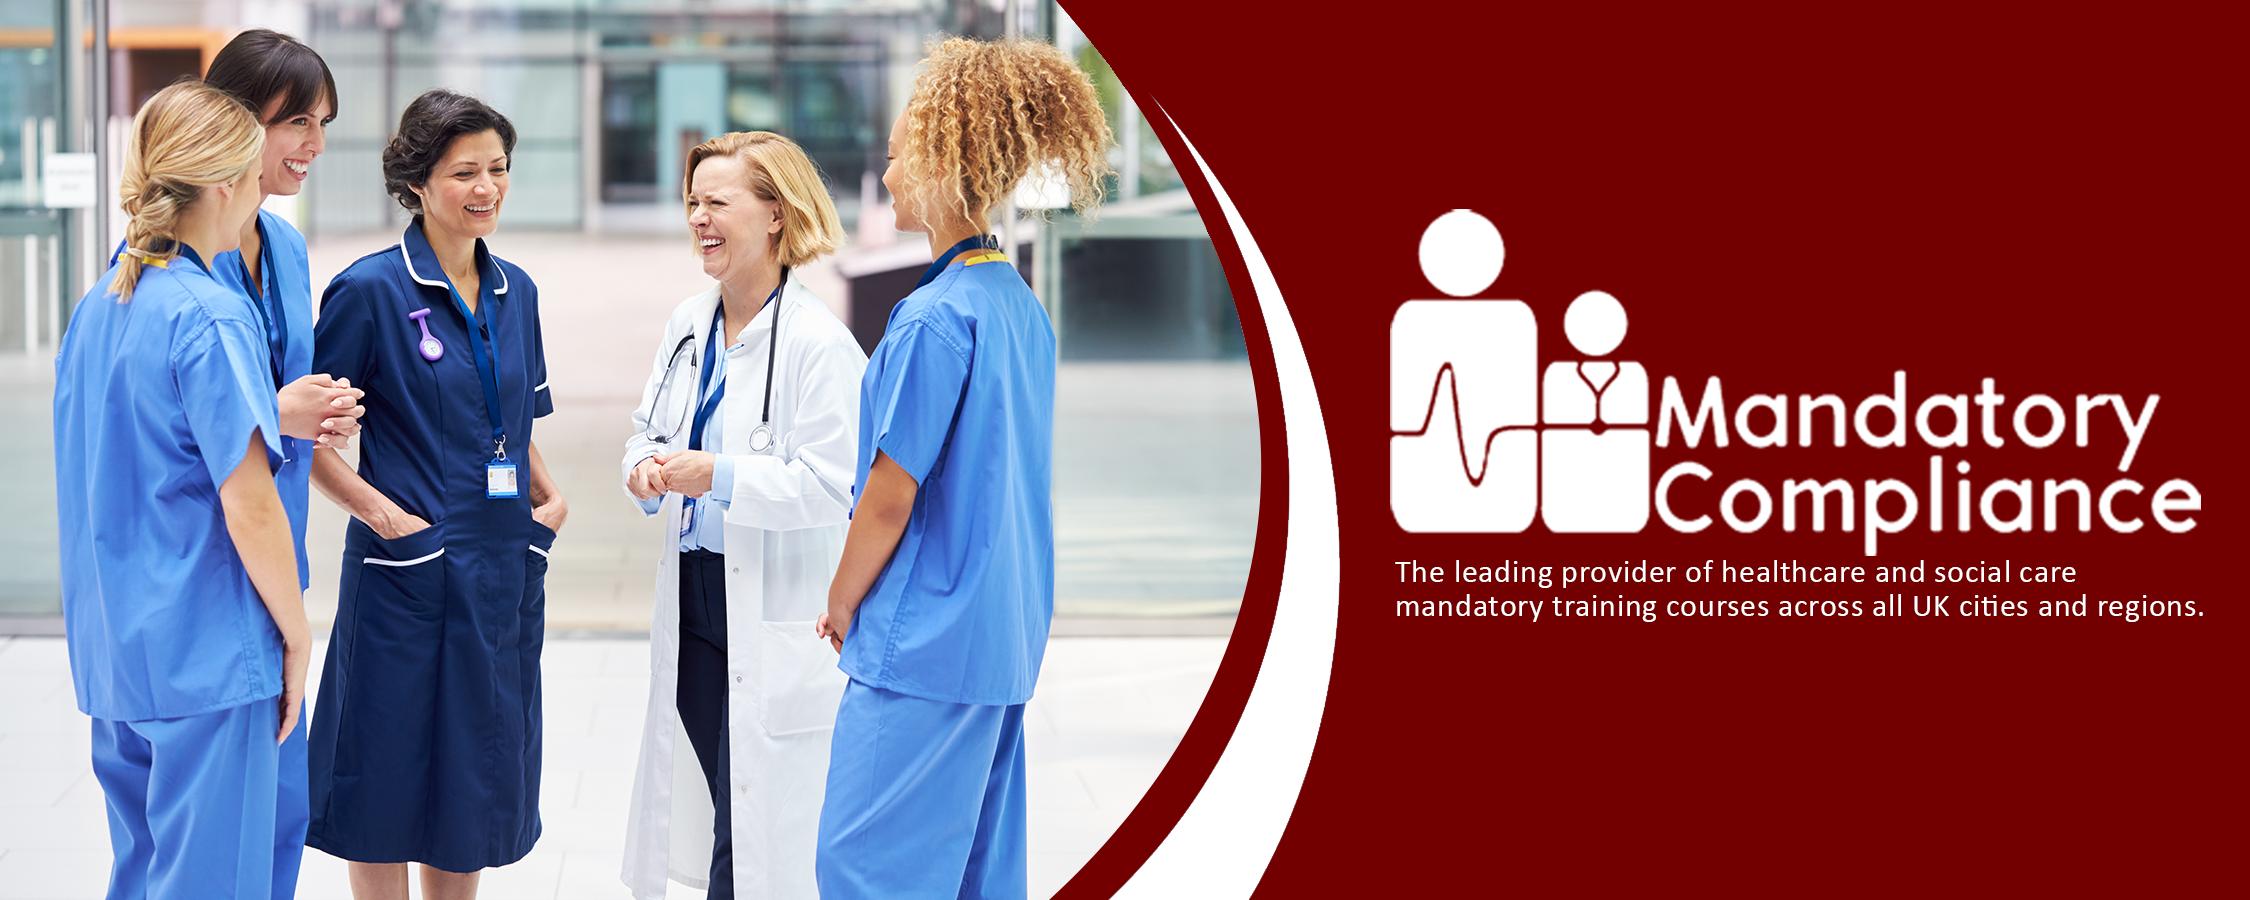 Recruitment - E-Learning-Courses-Mandatory-Compliance-UK-